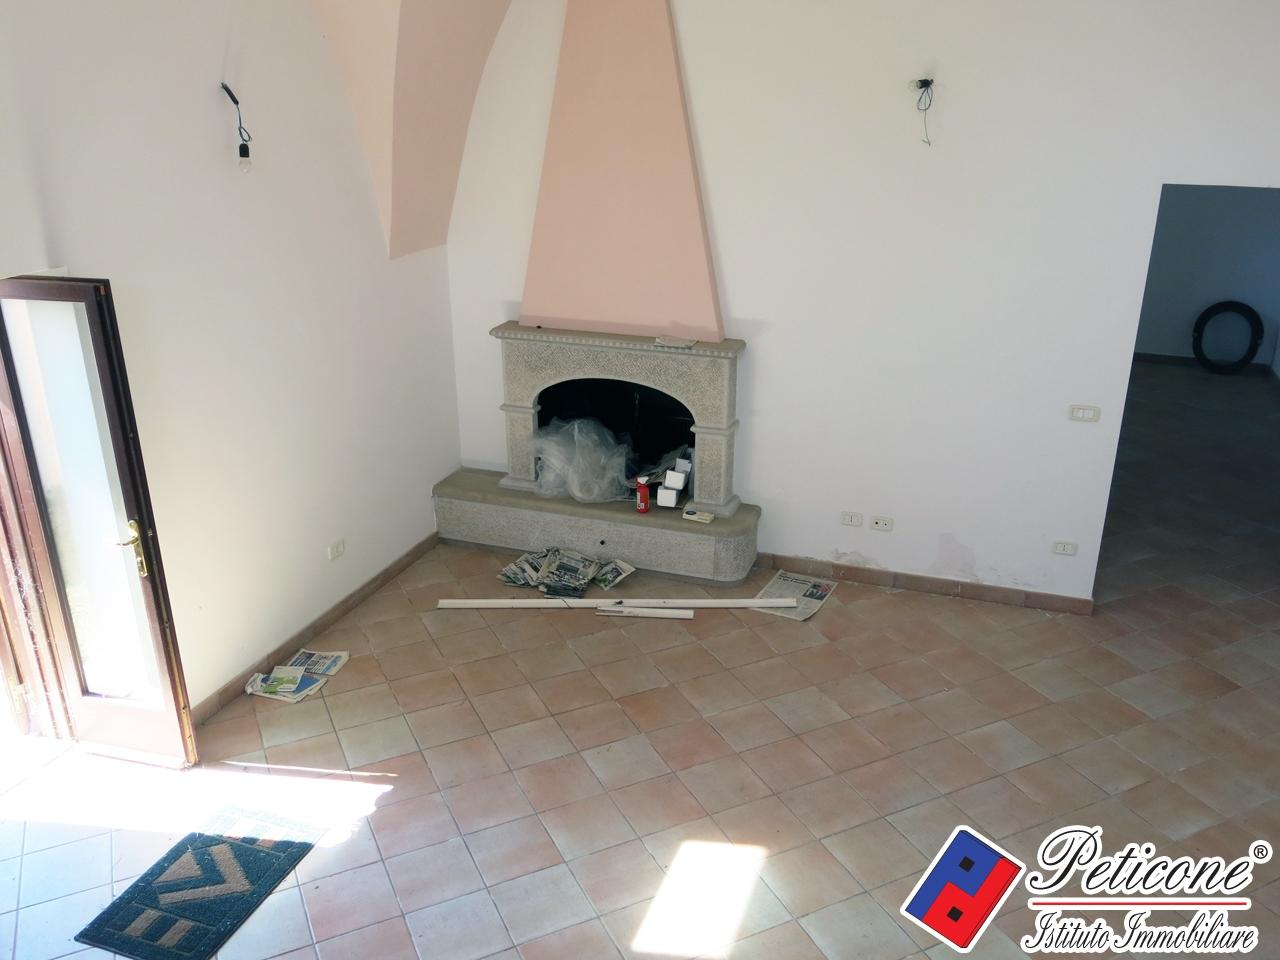 Villa in Vendita a Gaeta: 5 locali, 250 mq - Foto 4